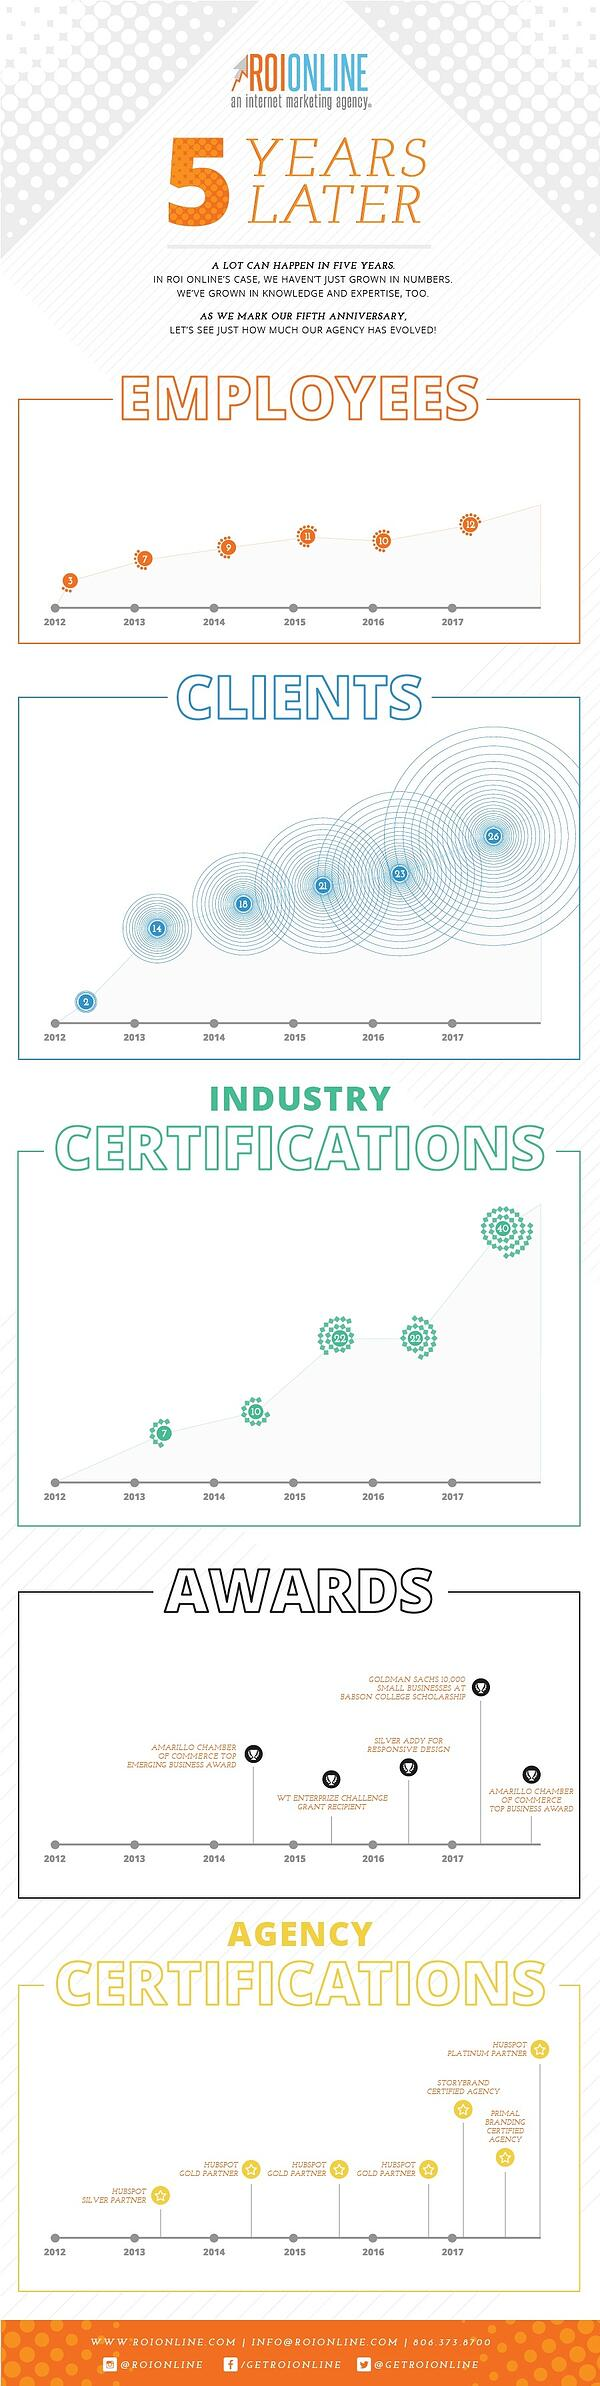 ROI Online - 5 Years Infographic.jpg